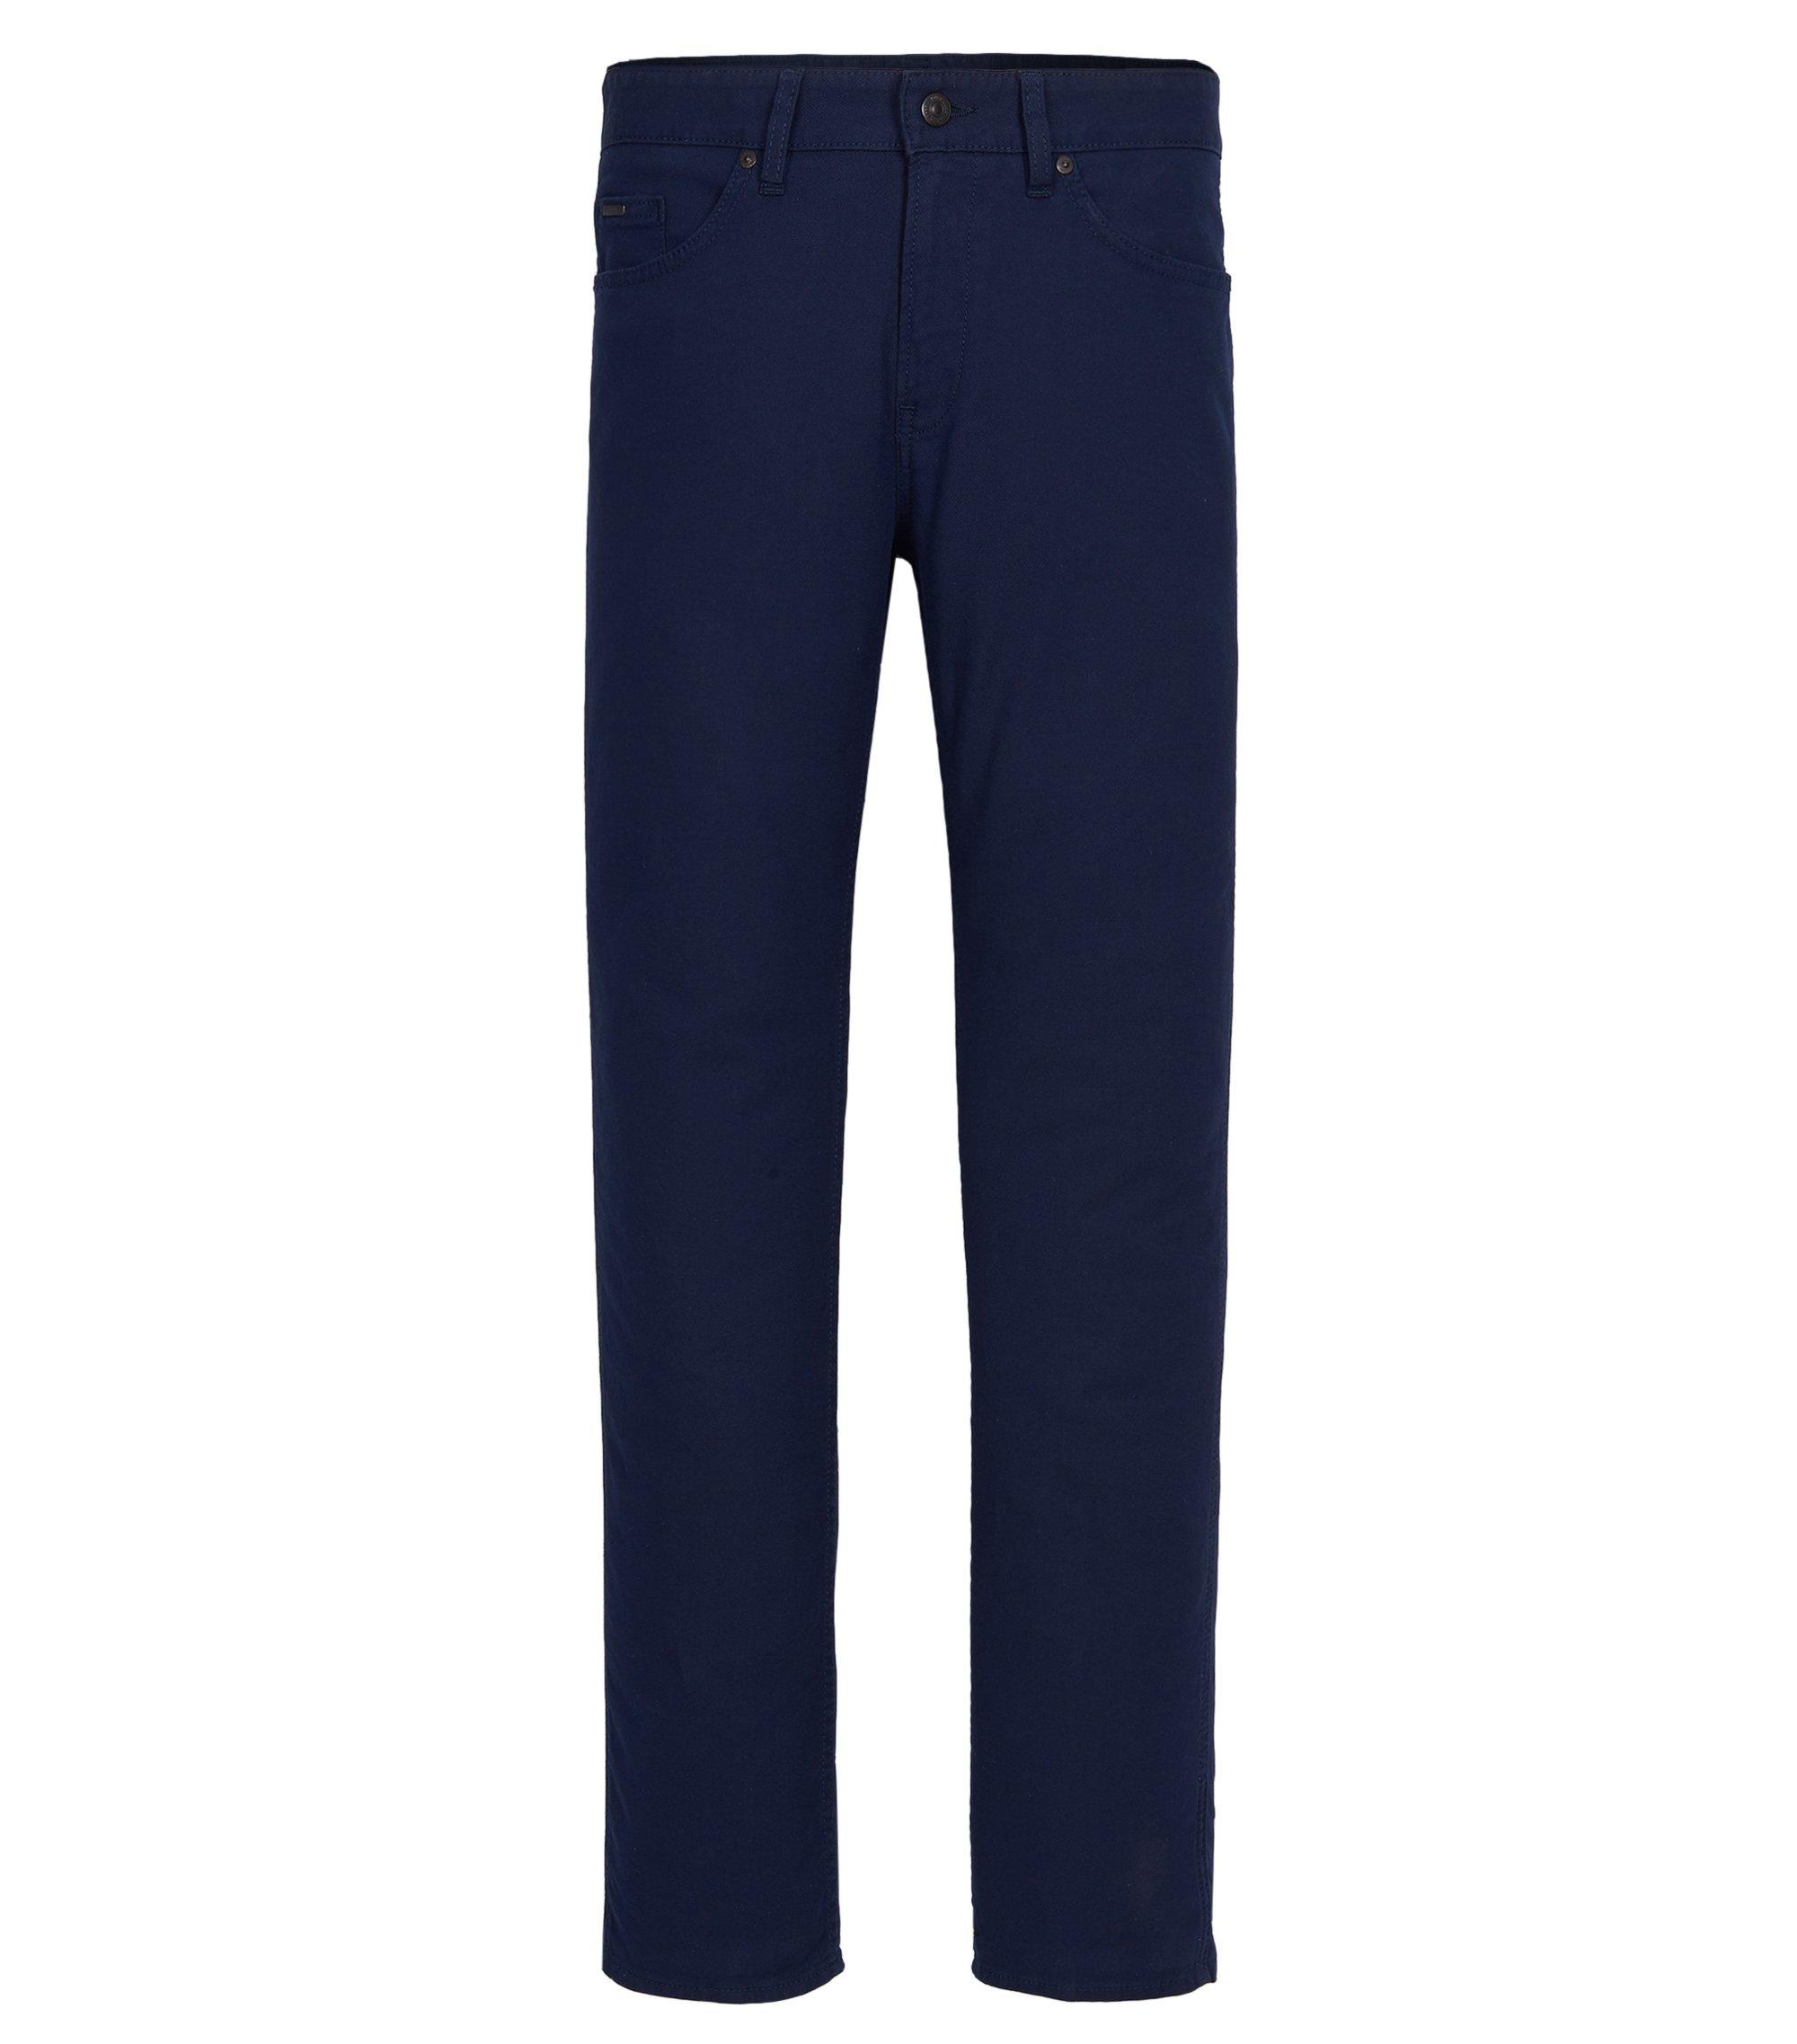 10 oz Stretch Cotton Pant, Slim Fit   Delaware, Dark Blue